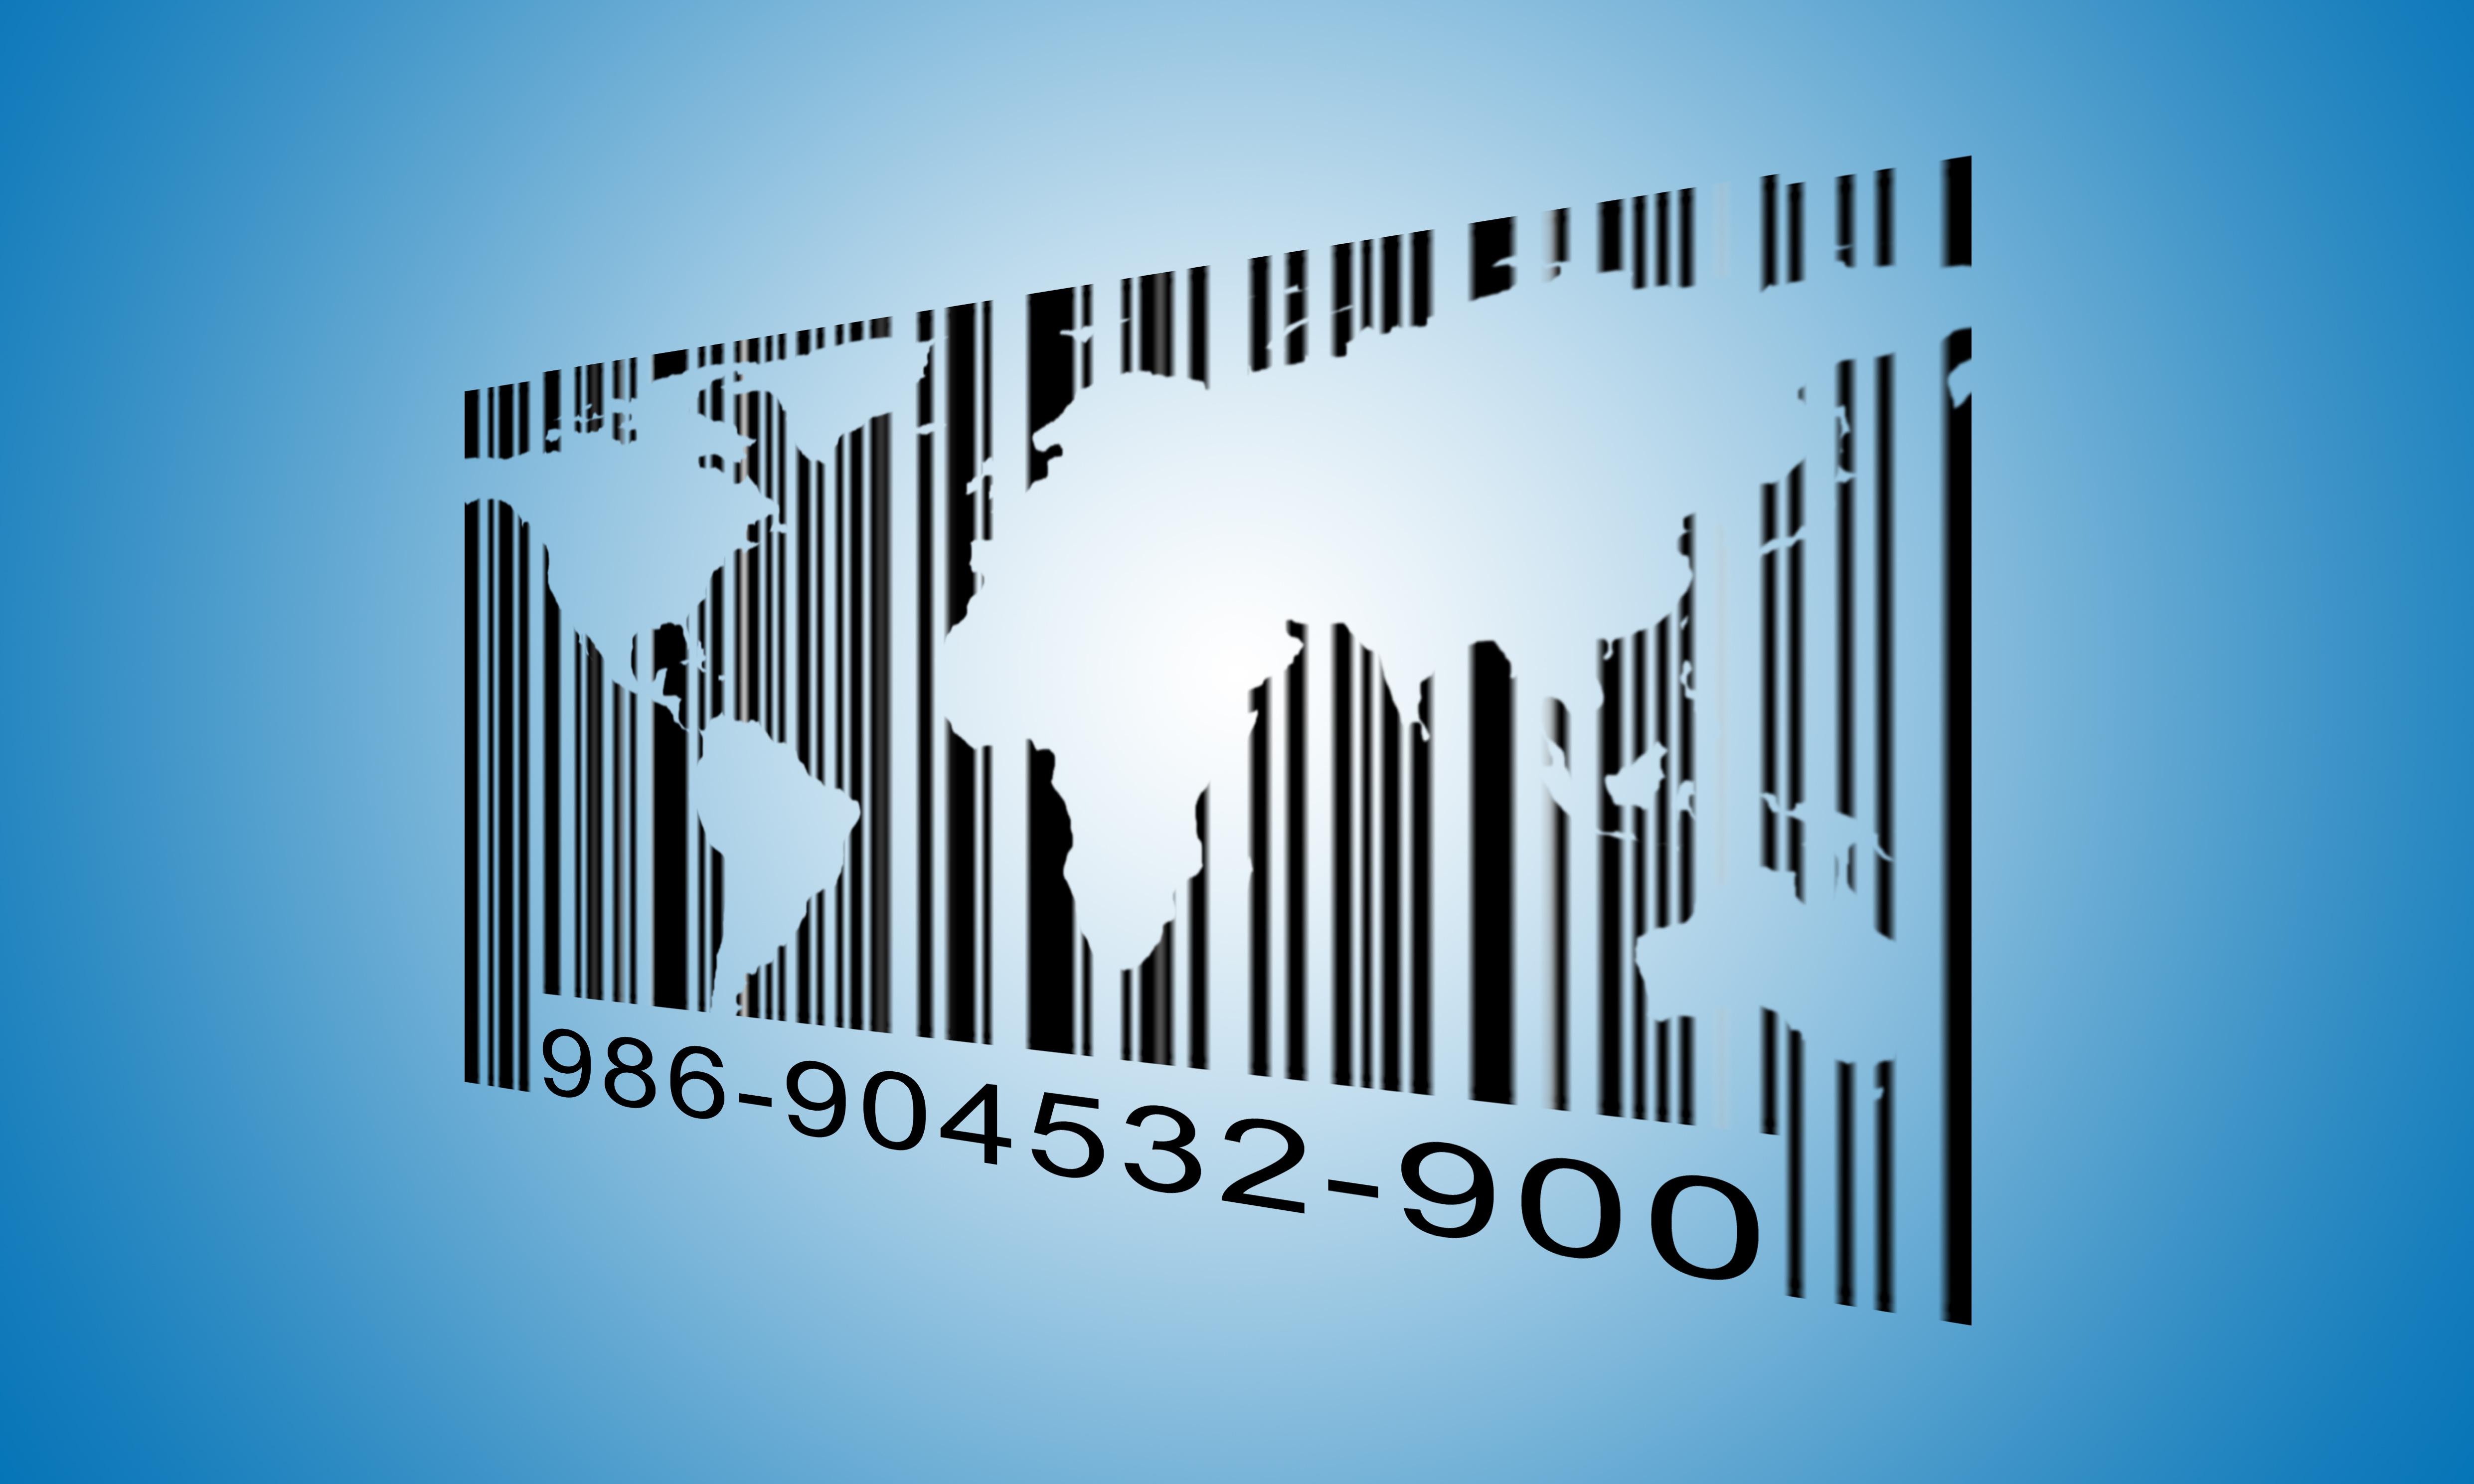 upc barcodes for amazon